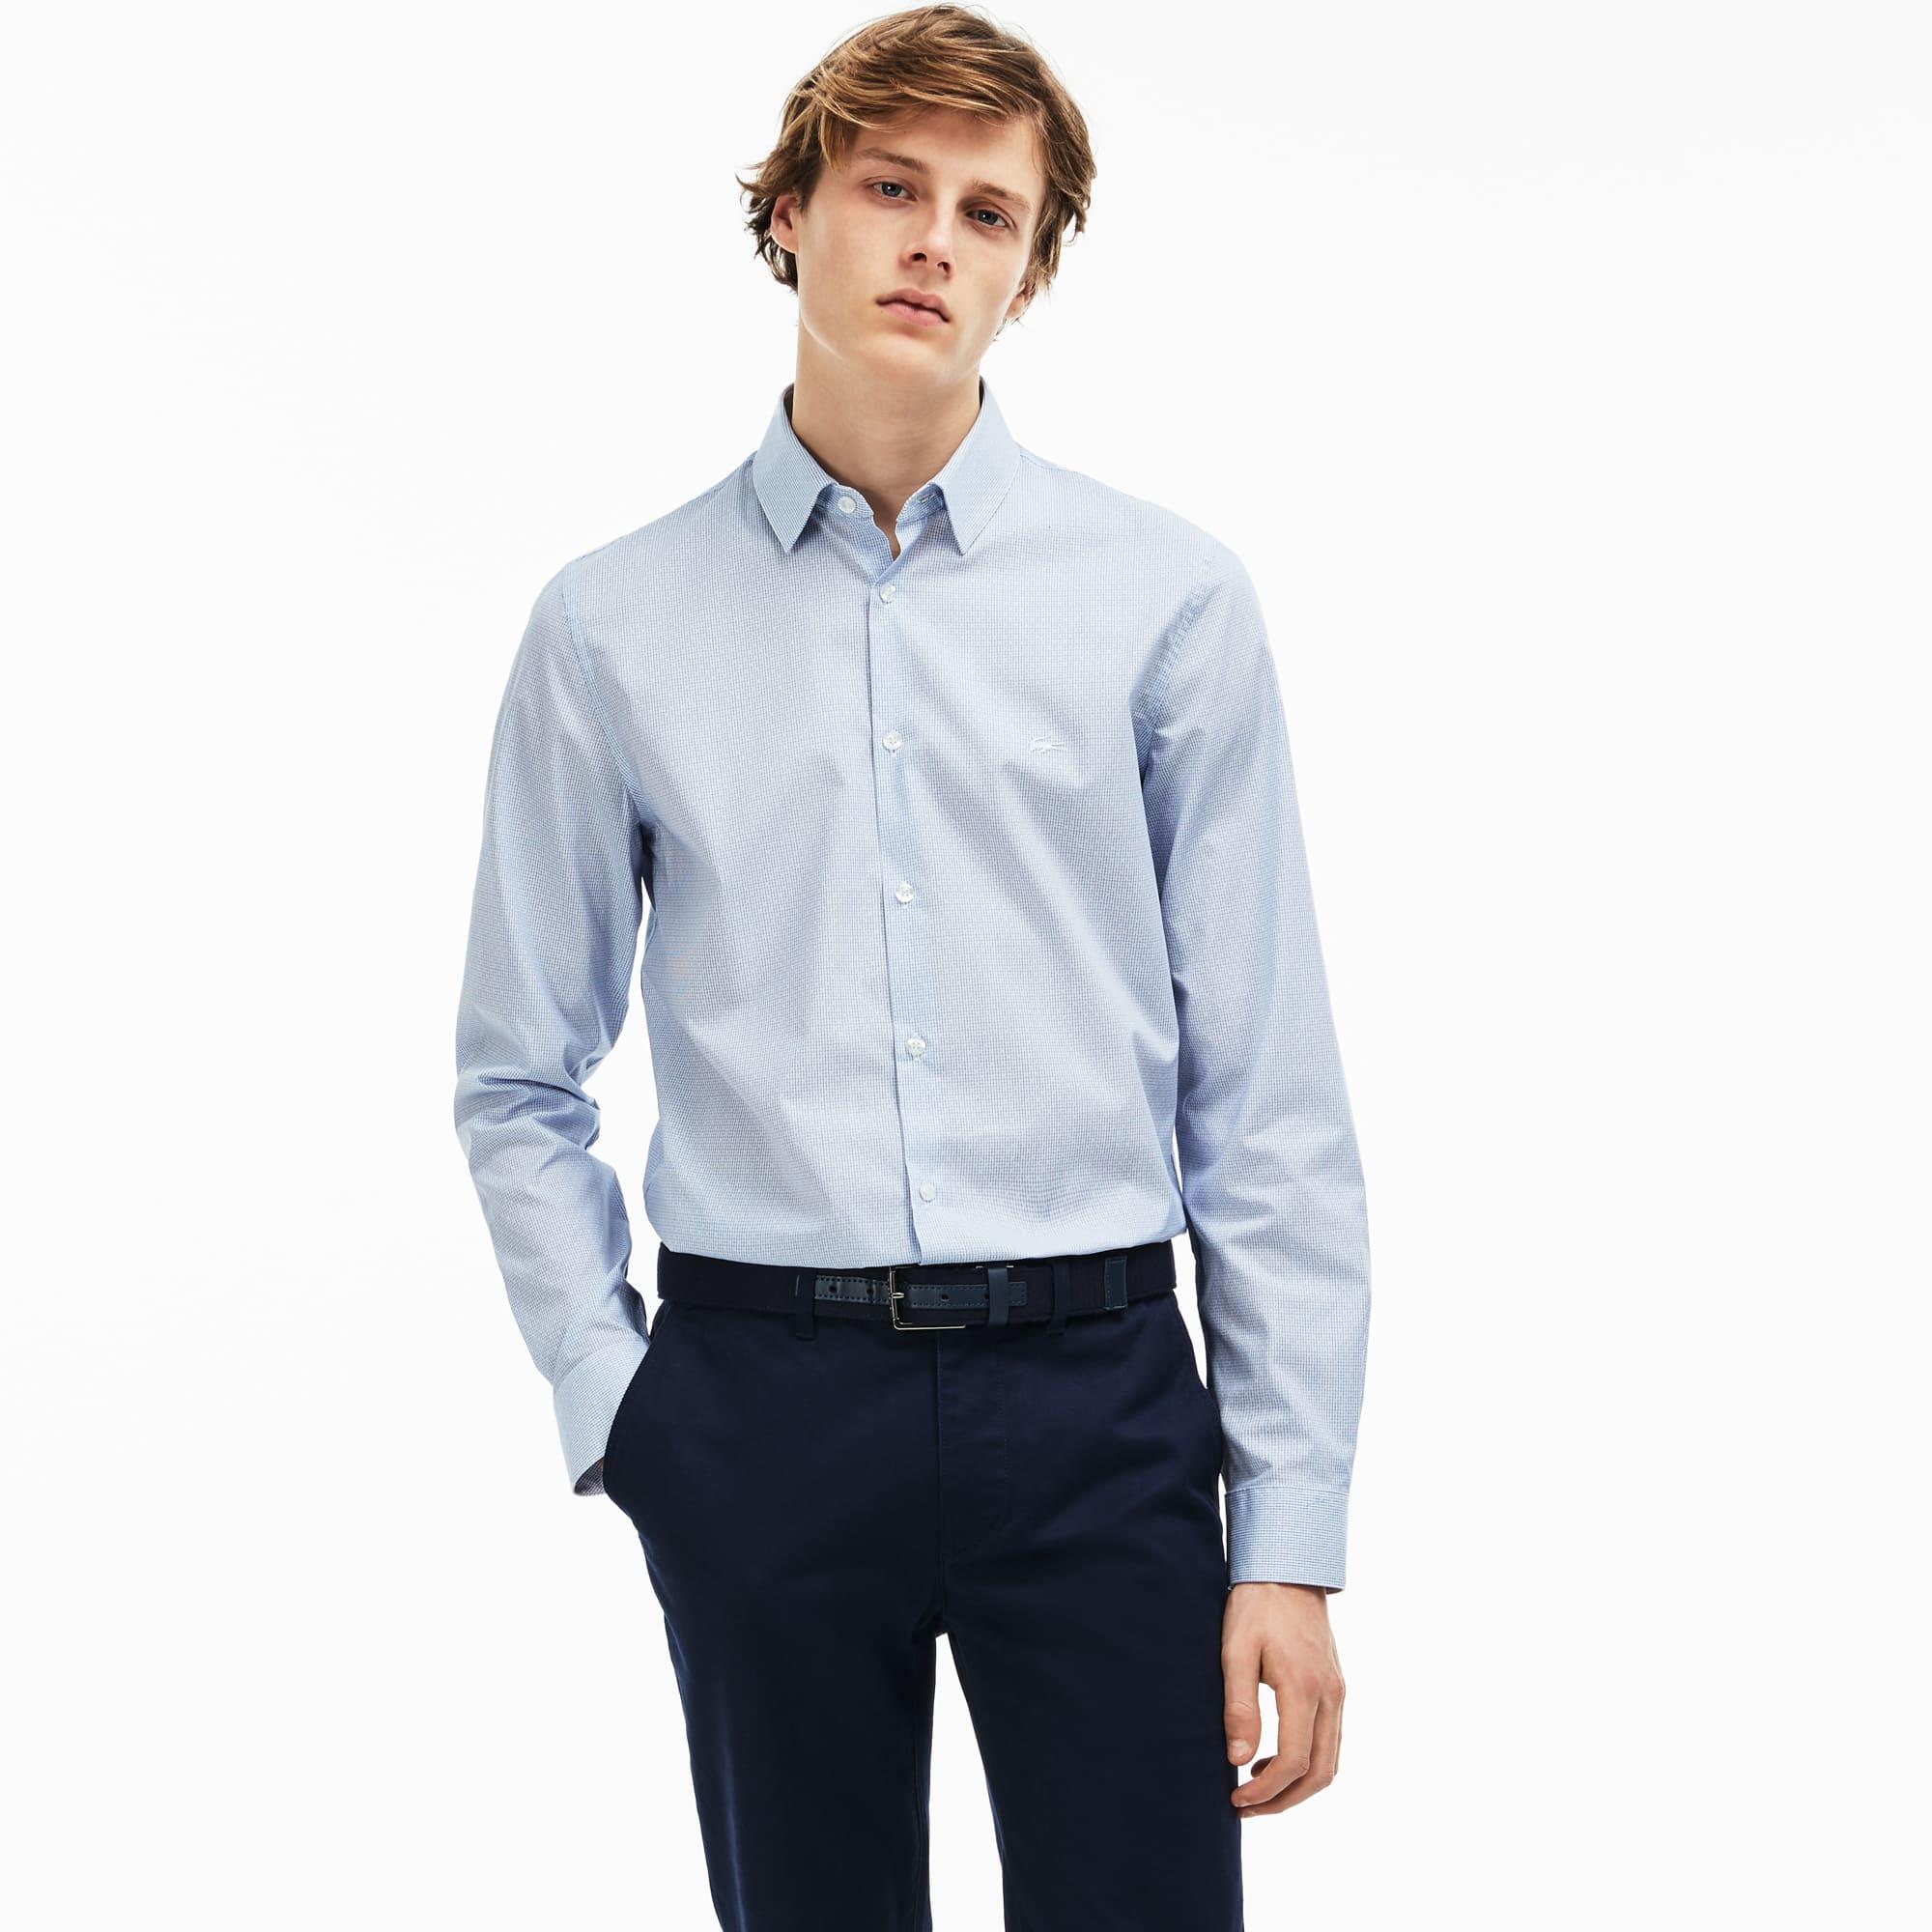 Slim Fit Herren-Hemd aus geometrisch bedruckter Jacquard-Popeline